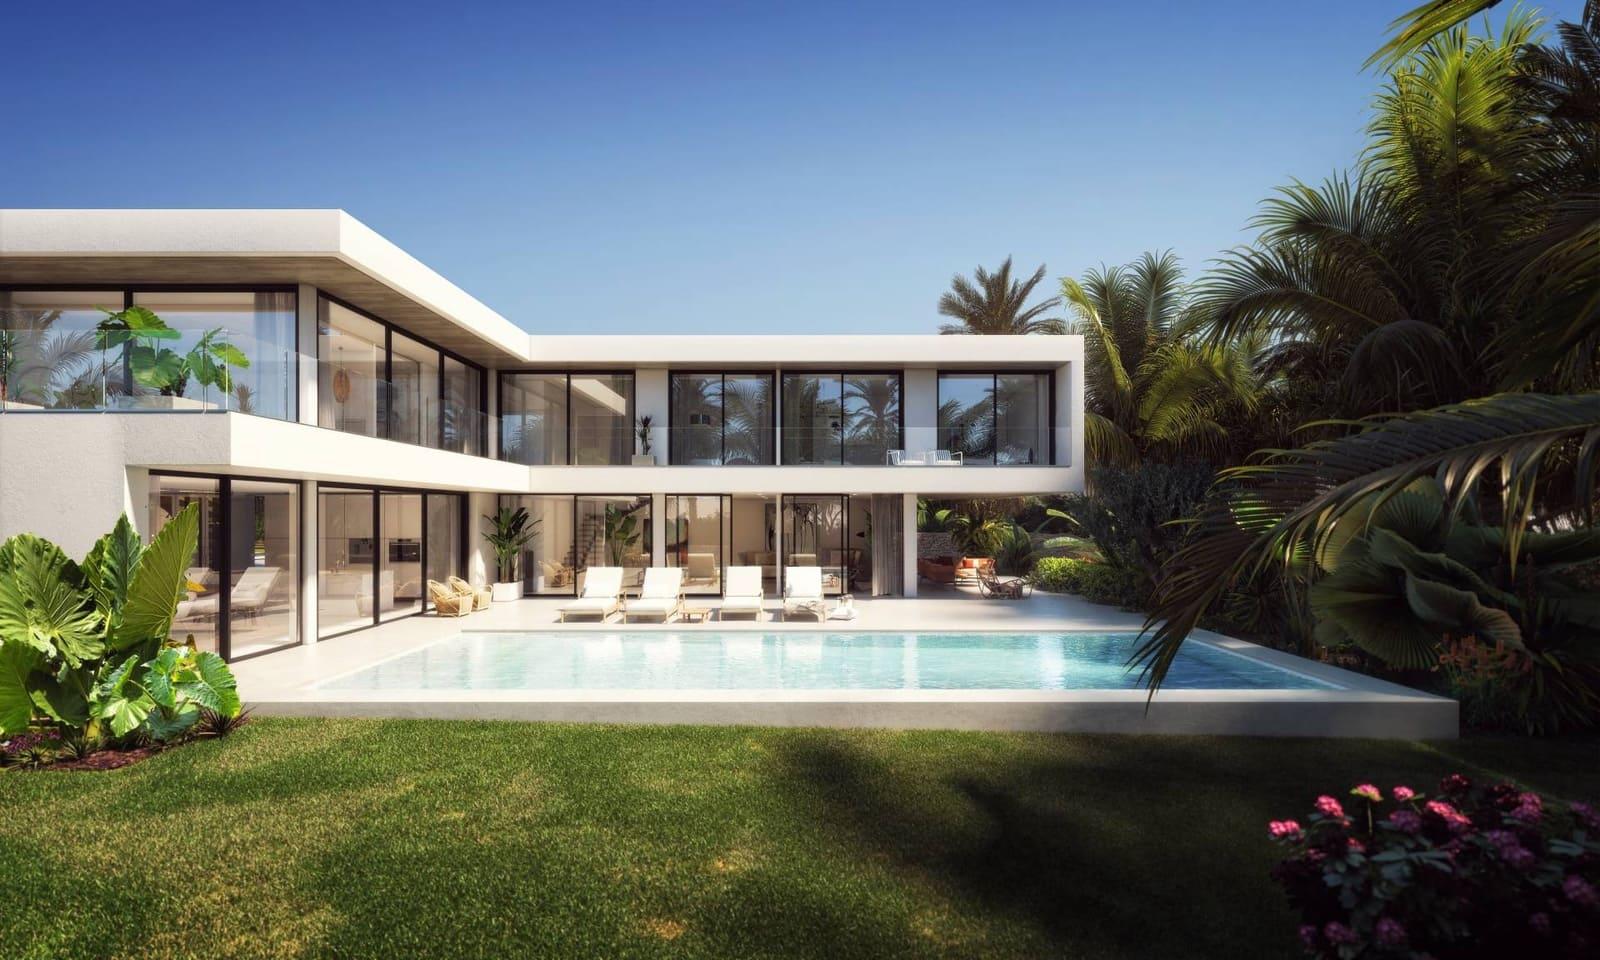 Byggetomt til salgs i Talamanca - € 1 200 000 (Ref: 5208991)